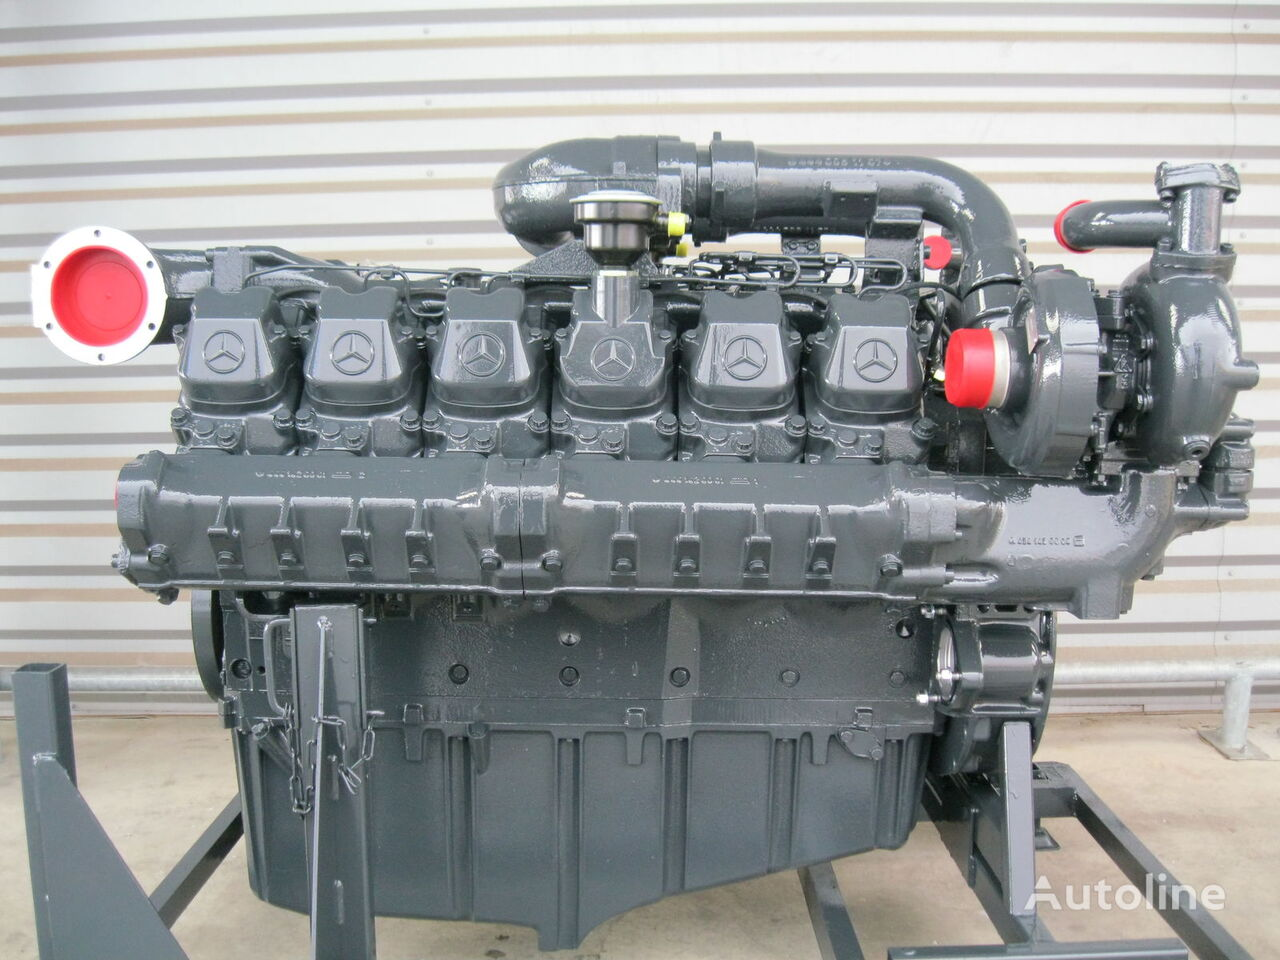 MERCEDES LIEBHERR motor voor mobiele kraan